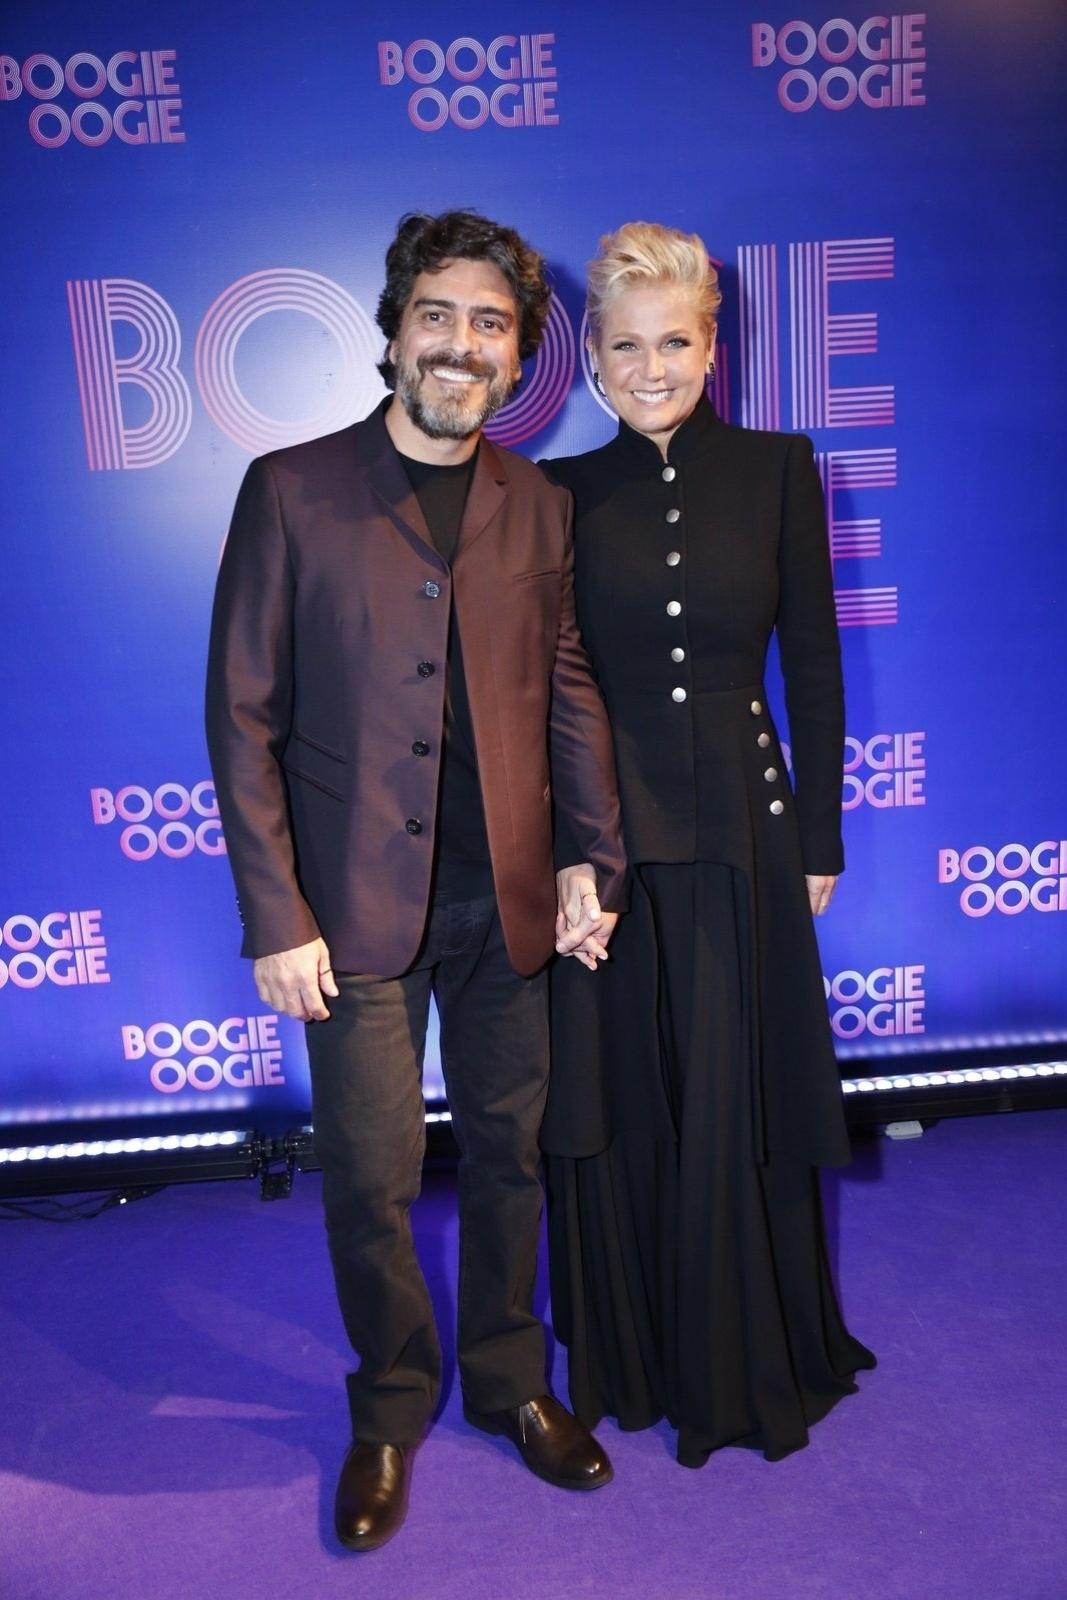 2.ago.2014 - Xuxa acompanha o namorado Junno no lançamento da novela